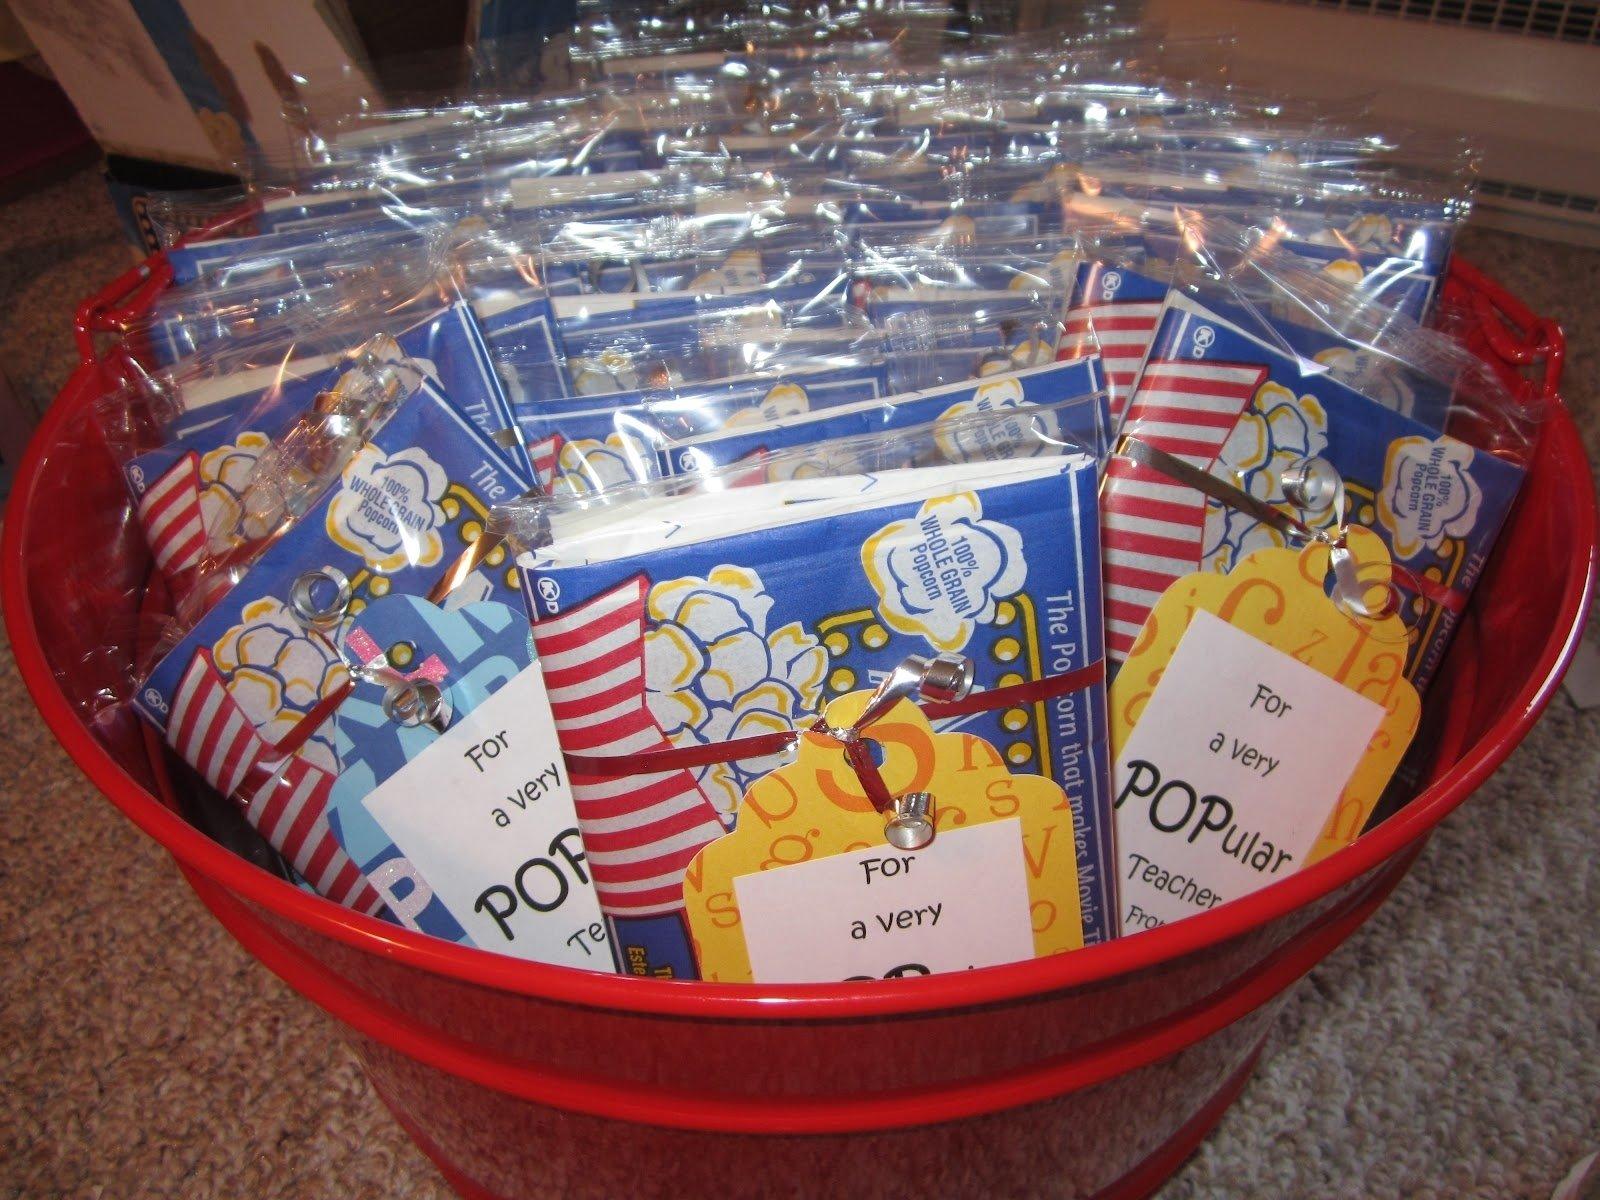 10 Fantastic Employee Appreciation Day Ideas Events gift ideas for nursing home staff jpg pixels craft ideas artonwheels